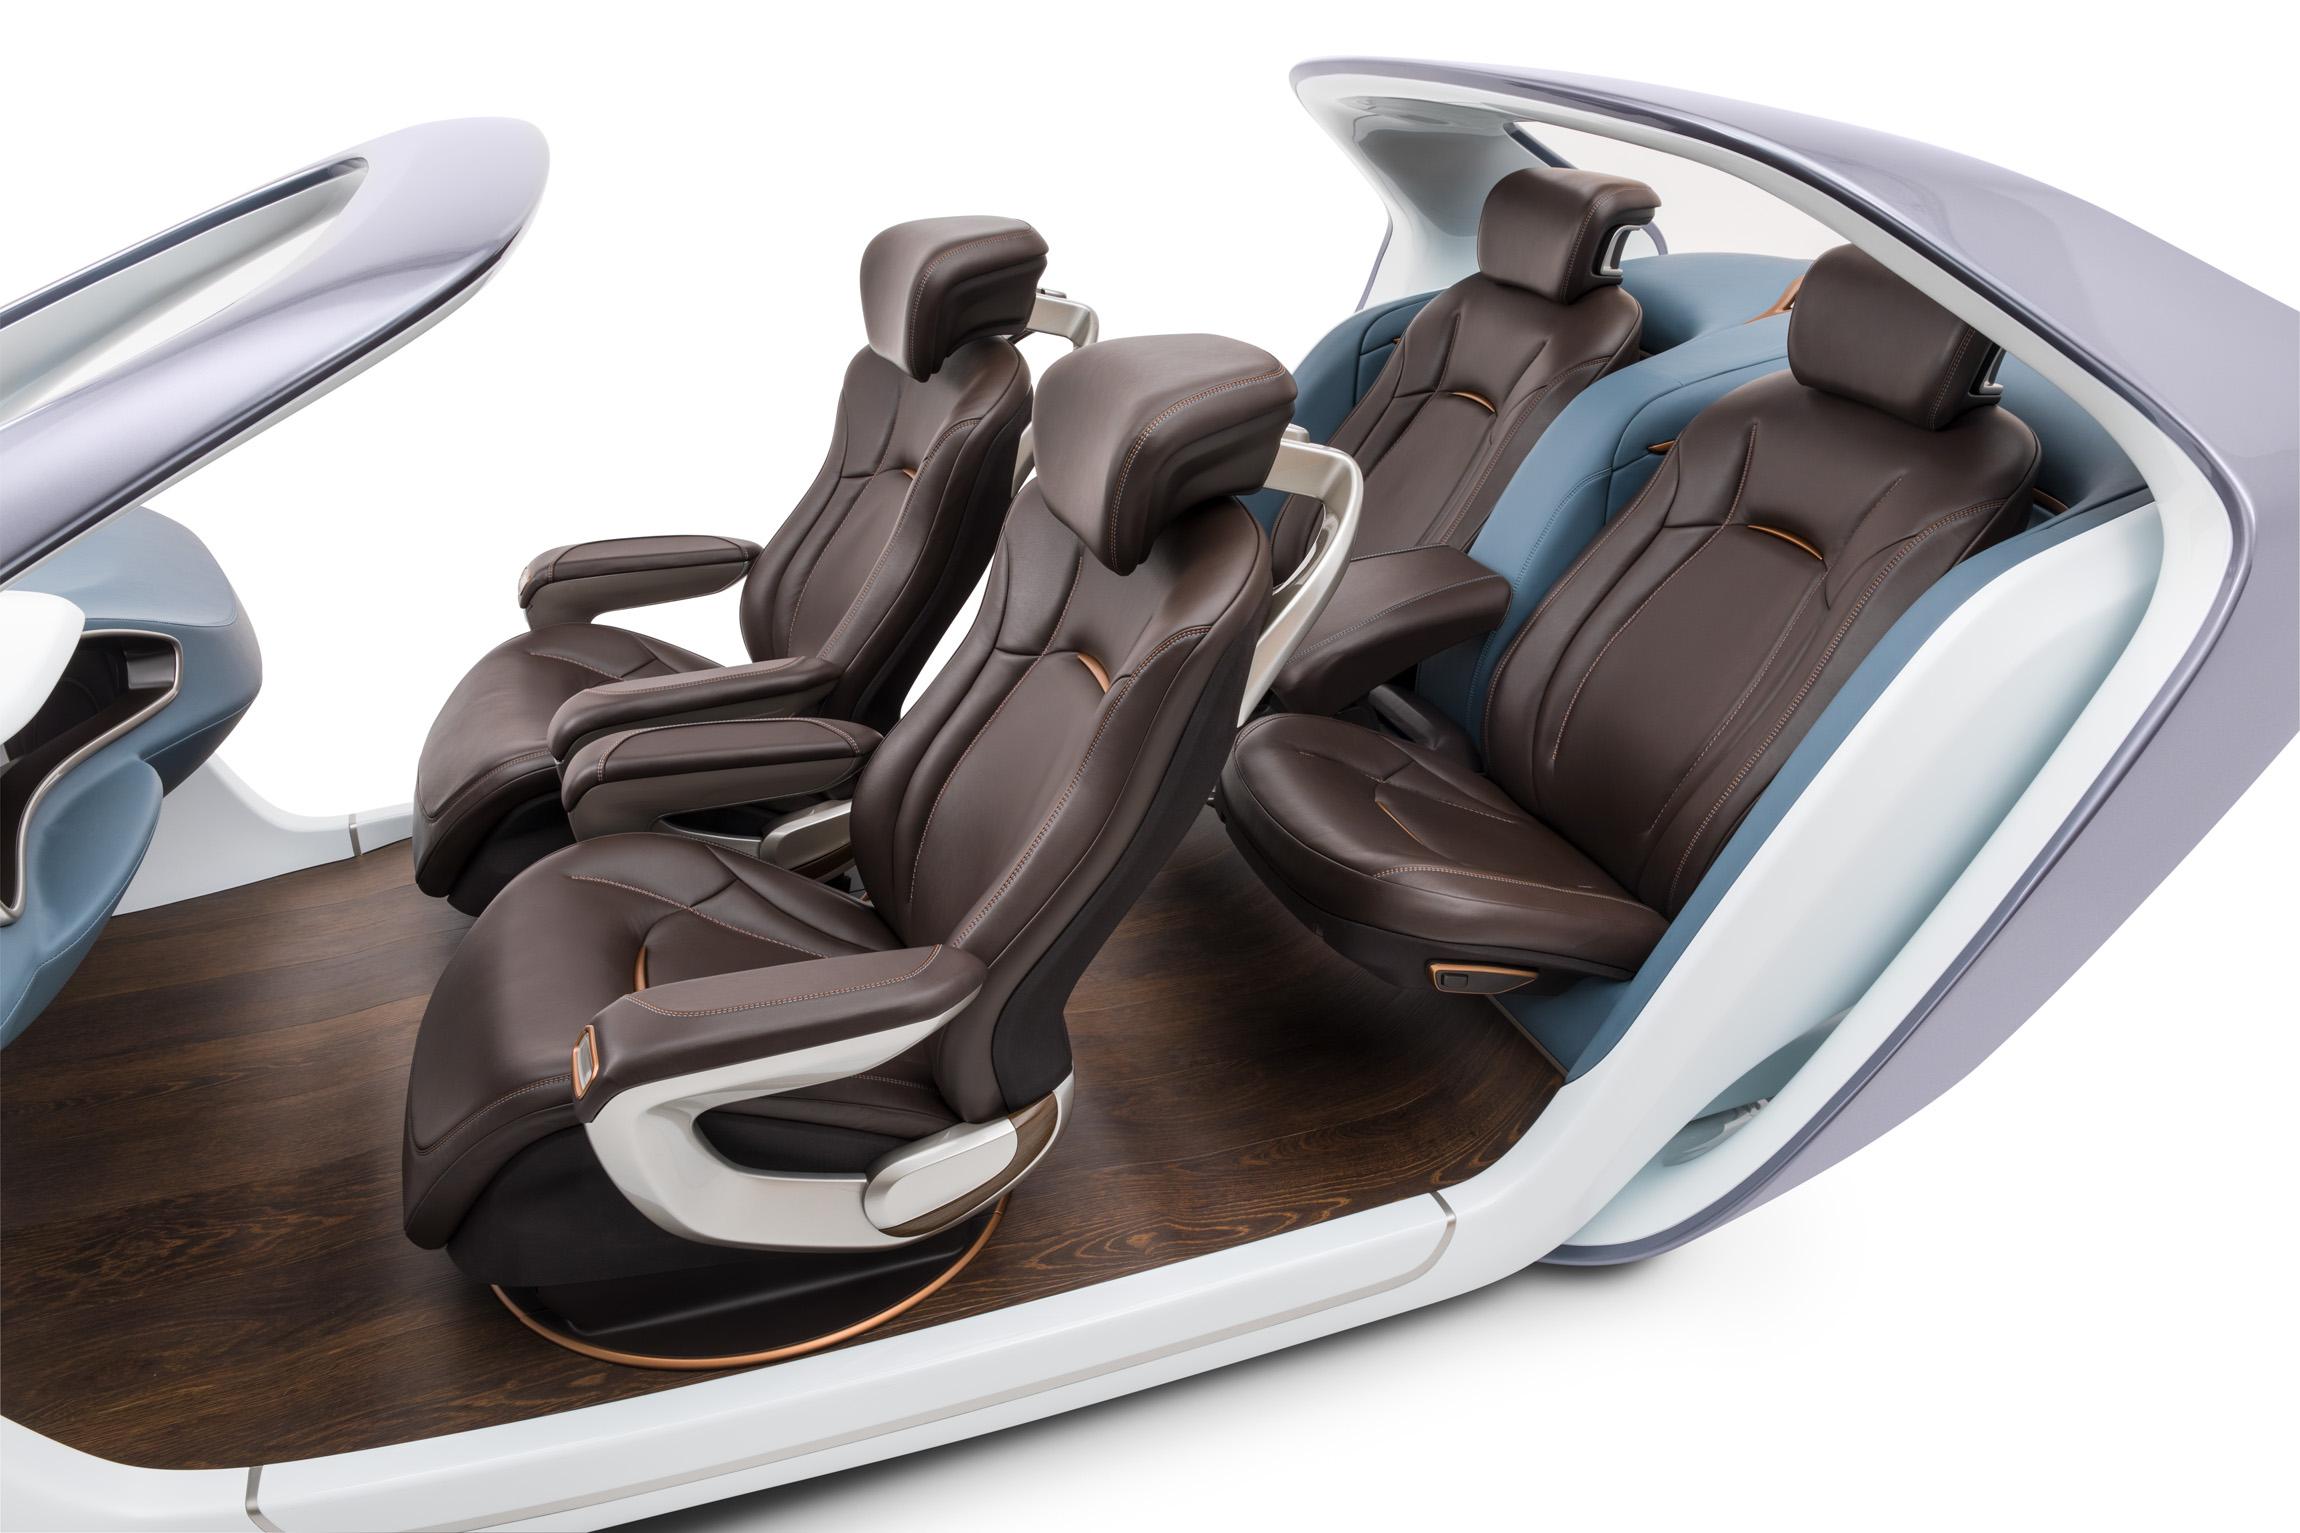 An automotive interior design.